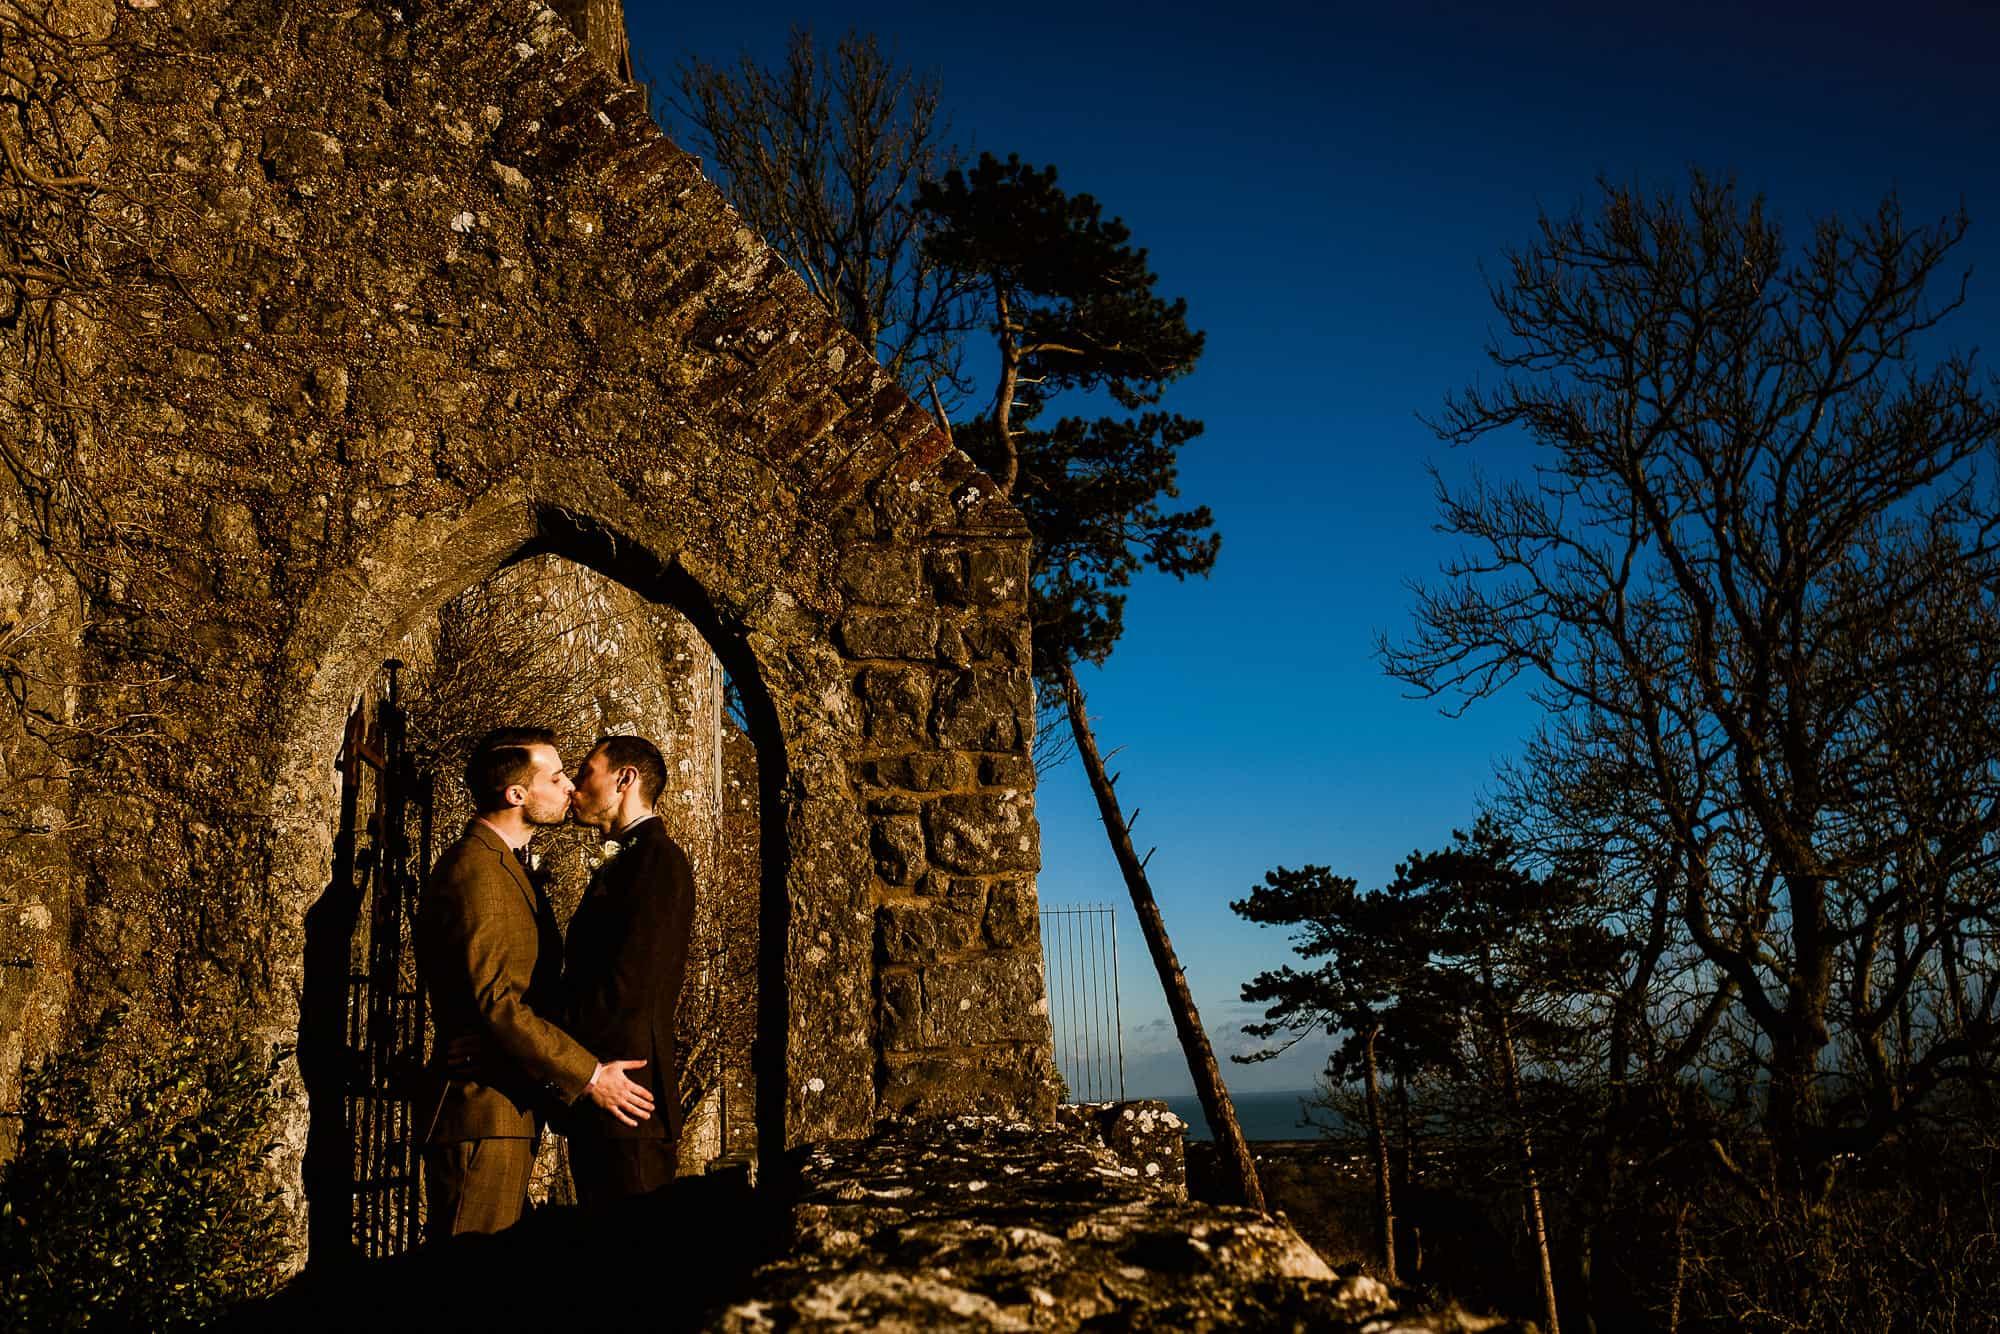 lympne-castle-wedding-photographer-matt-tyler-0023